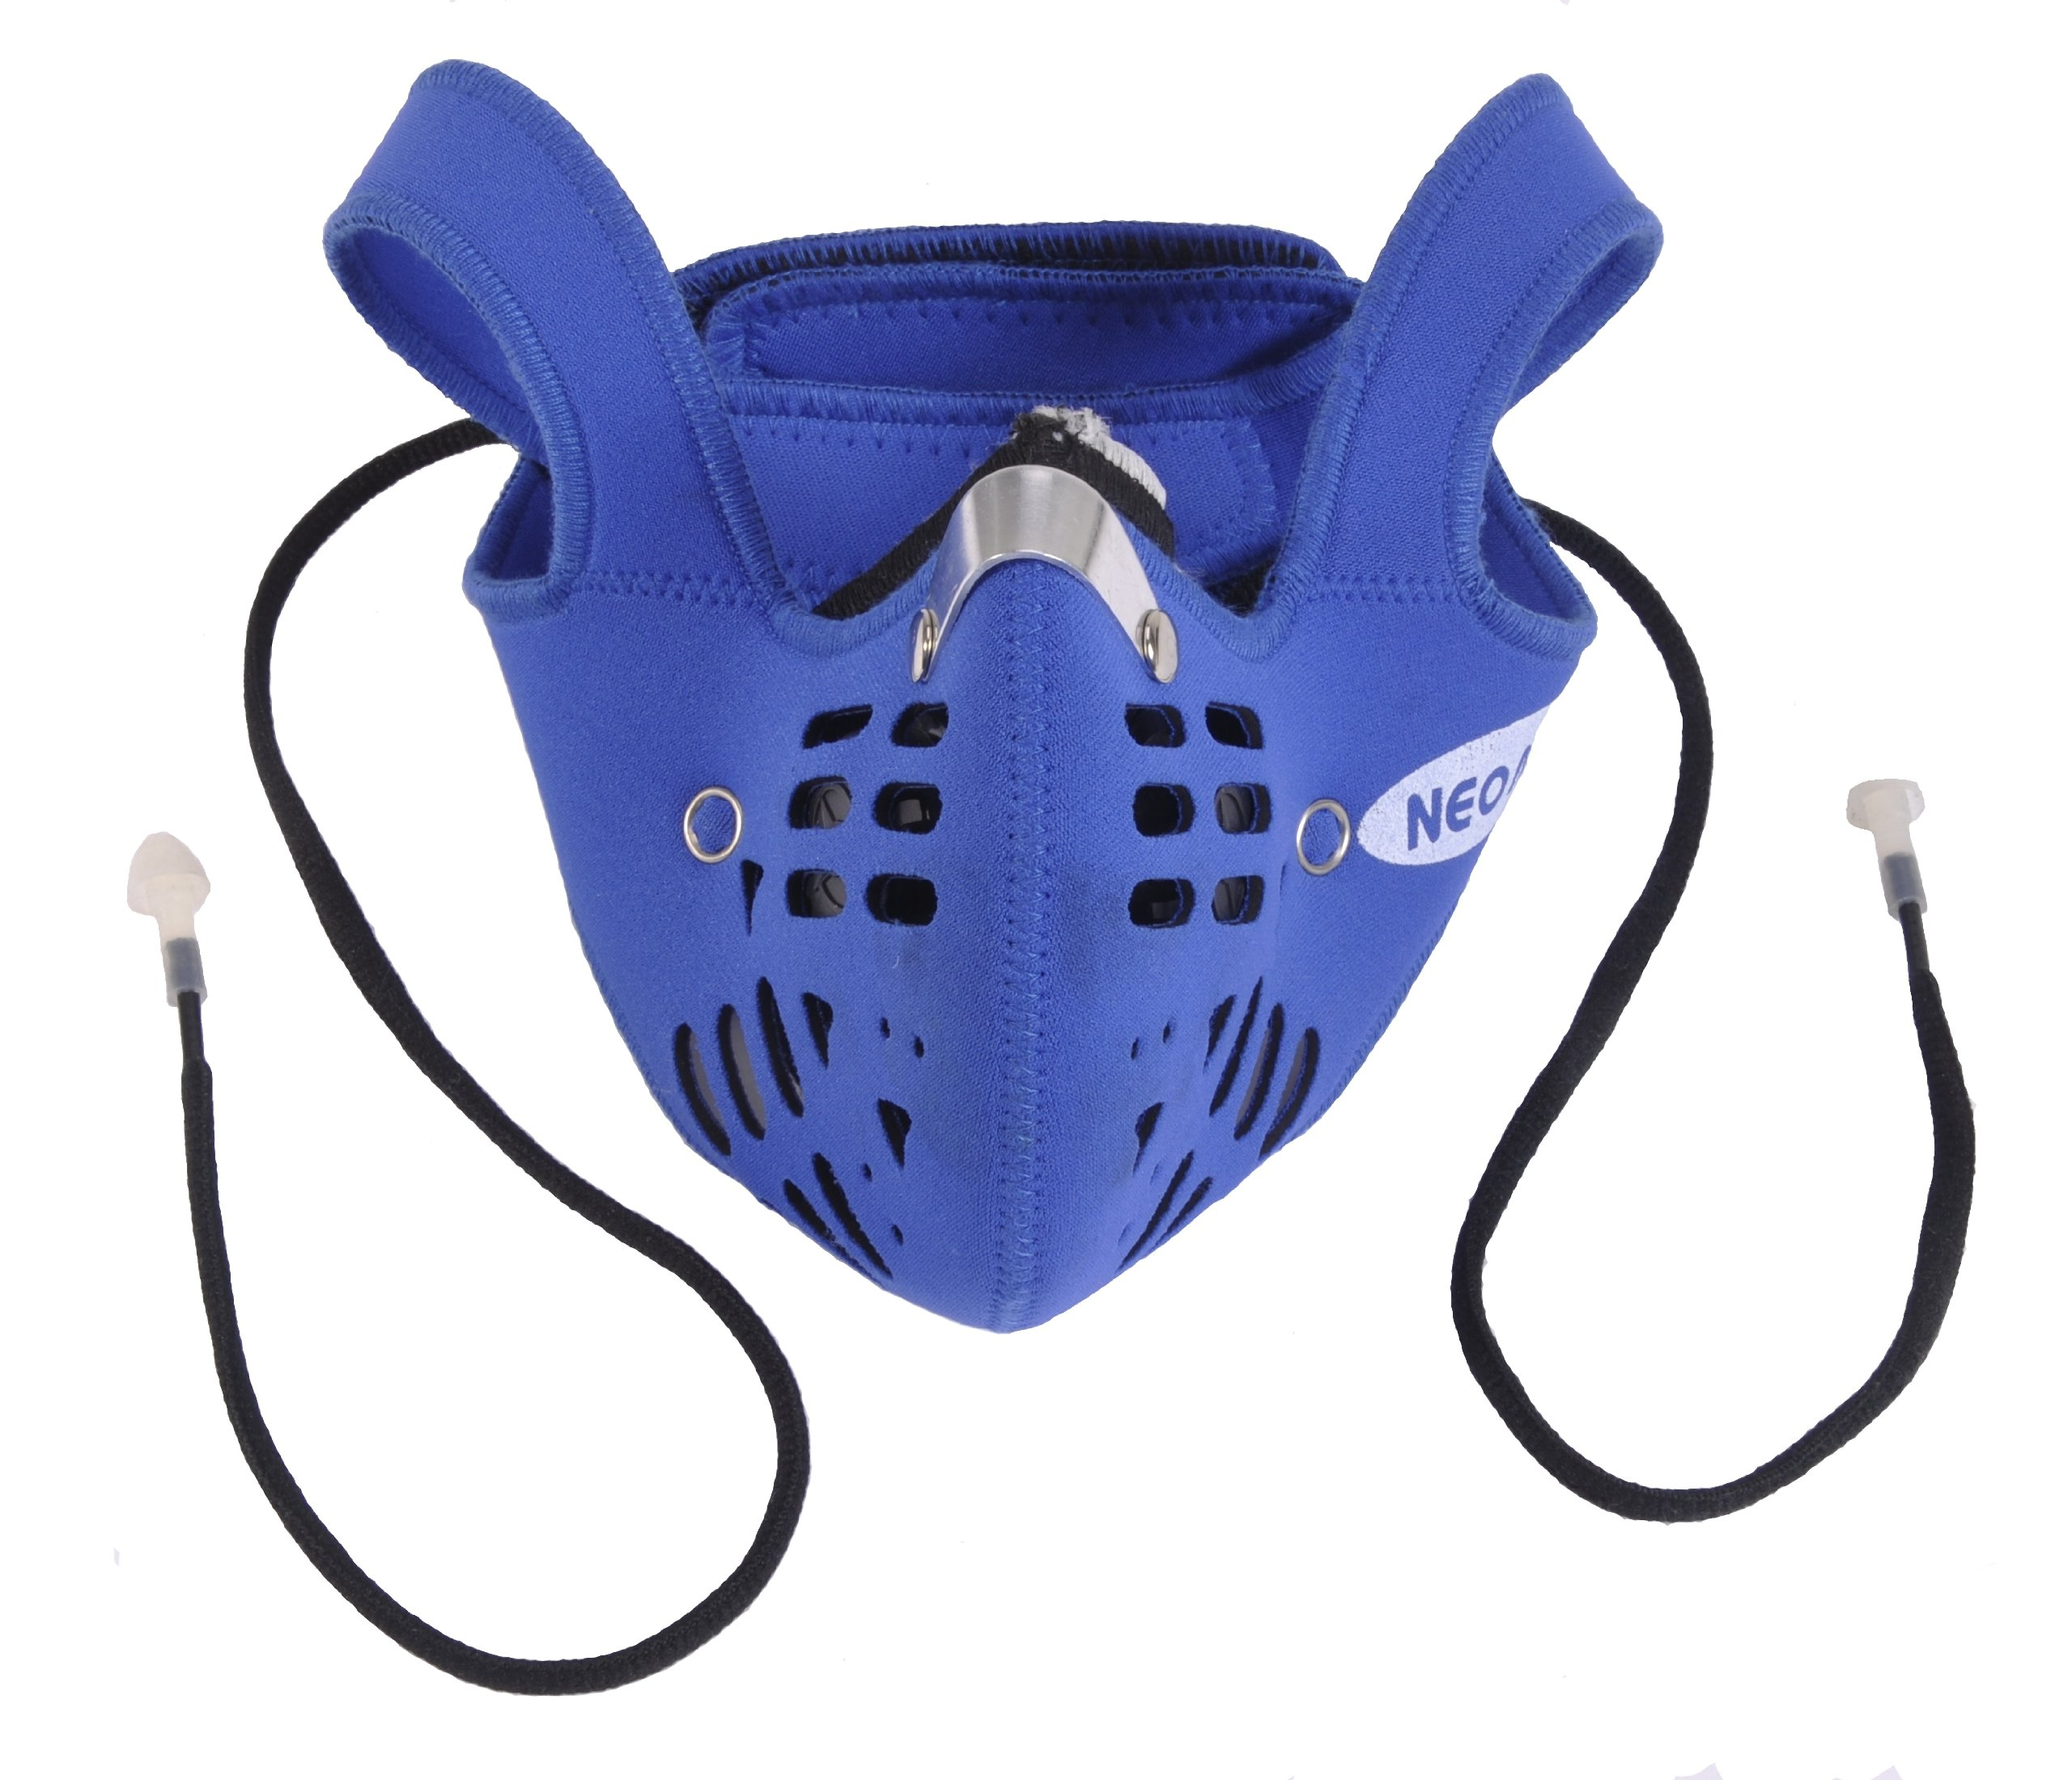 NeoMask - Neoprene Carbon Safety Mask - Multi-Purpose Dust Mask